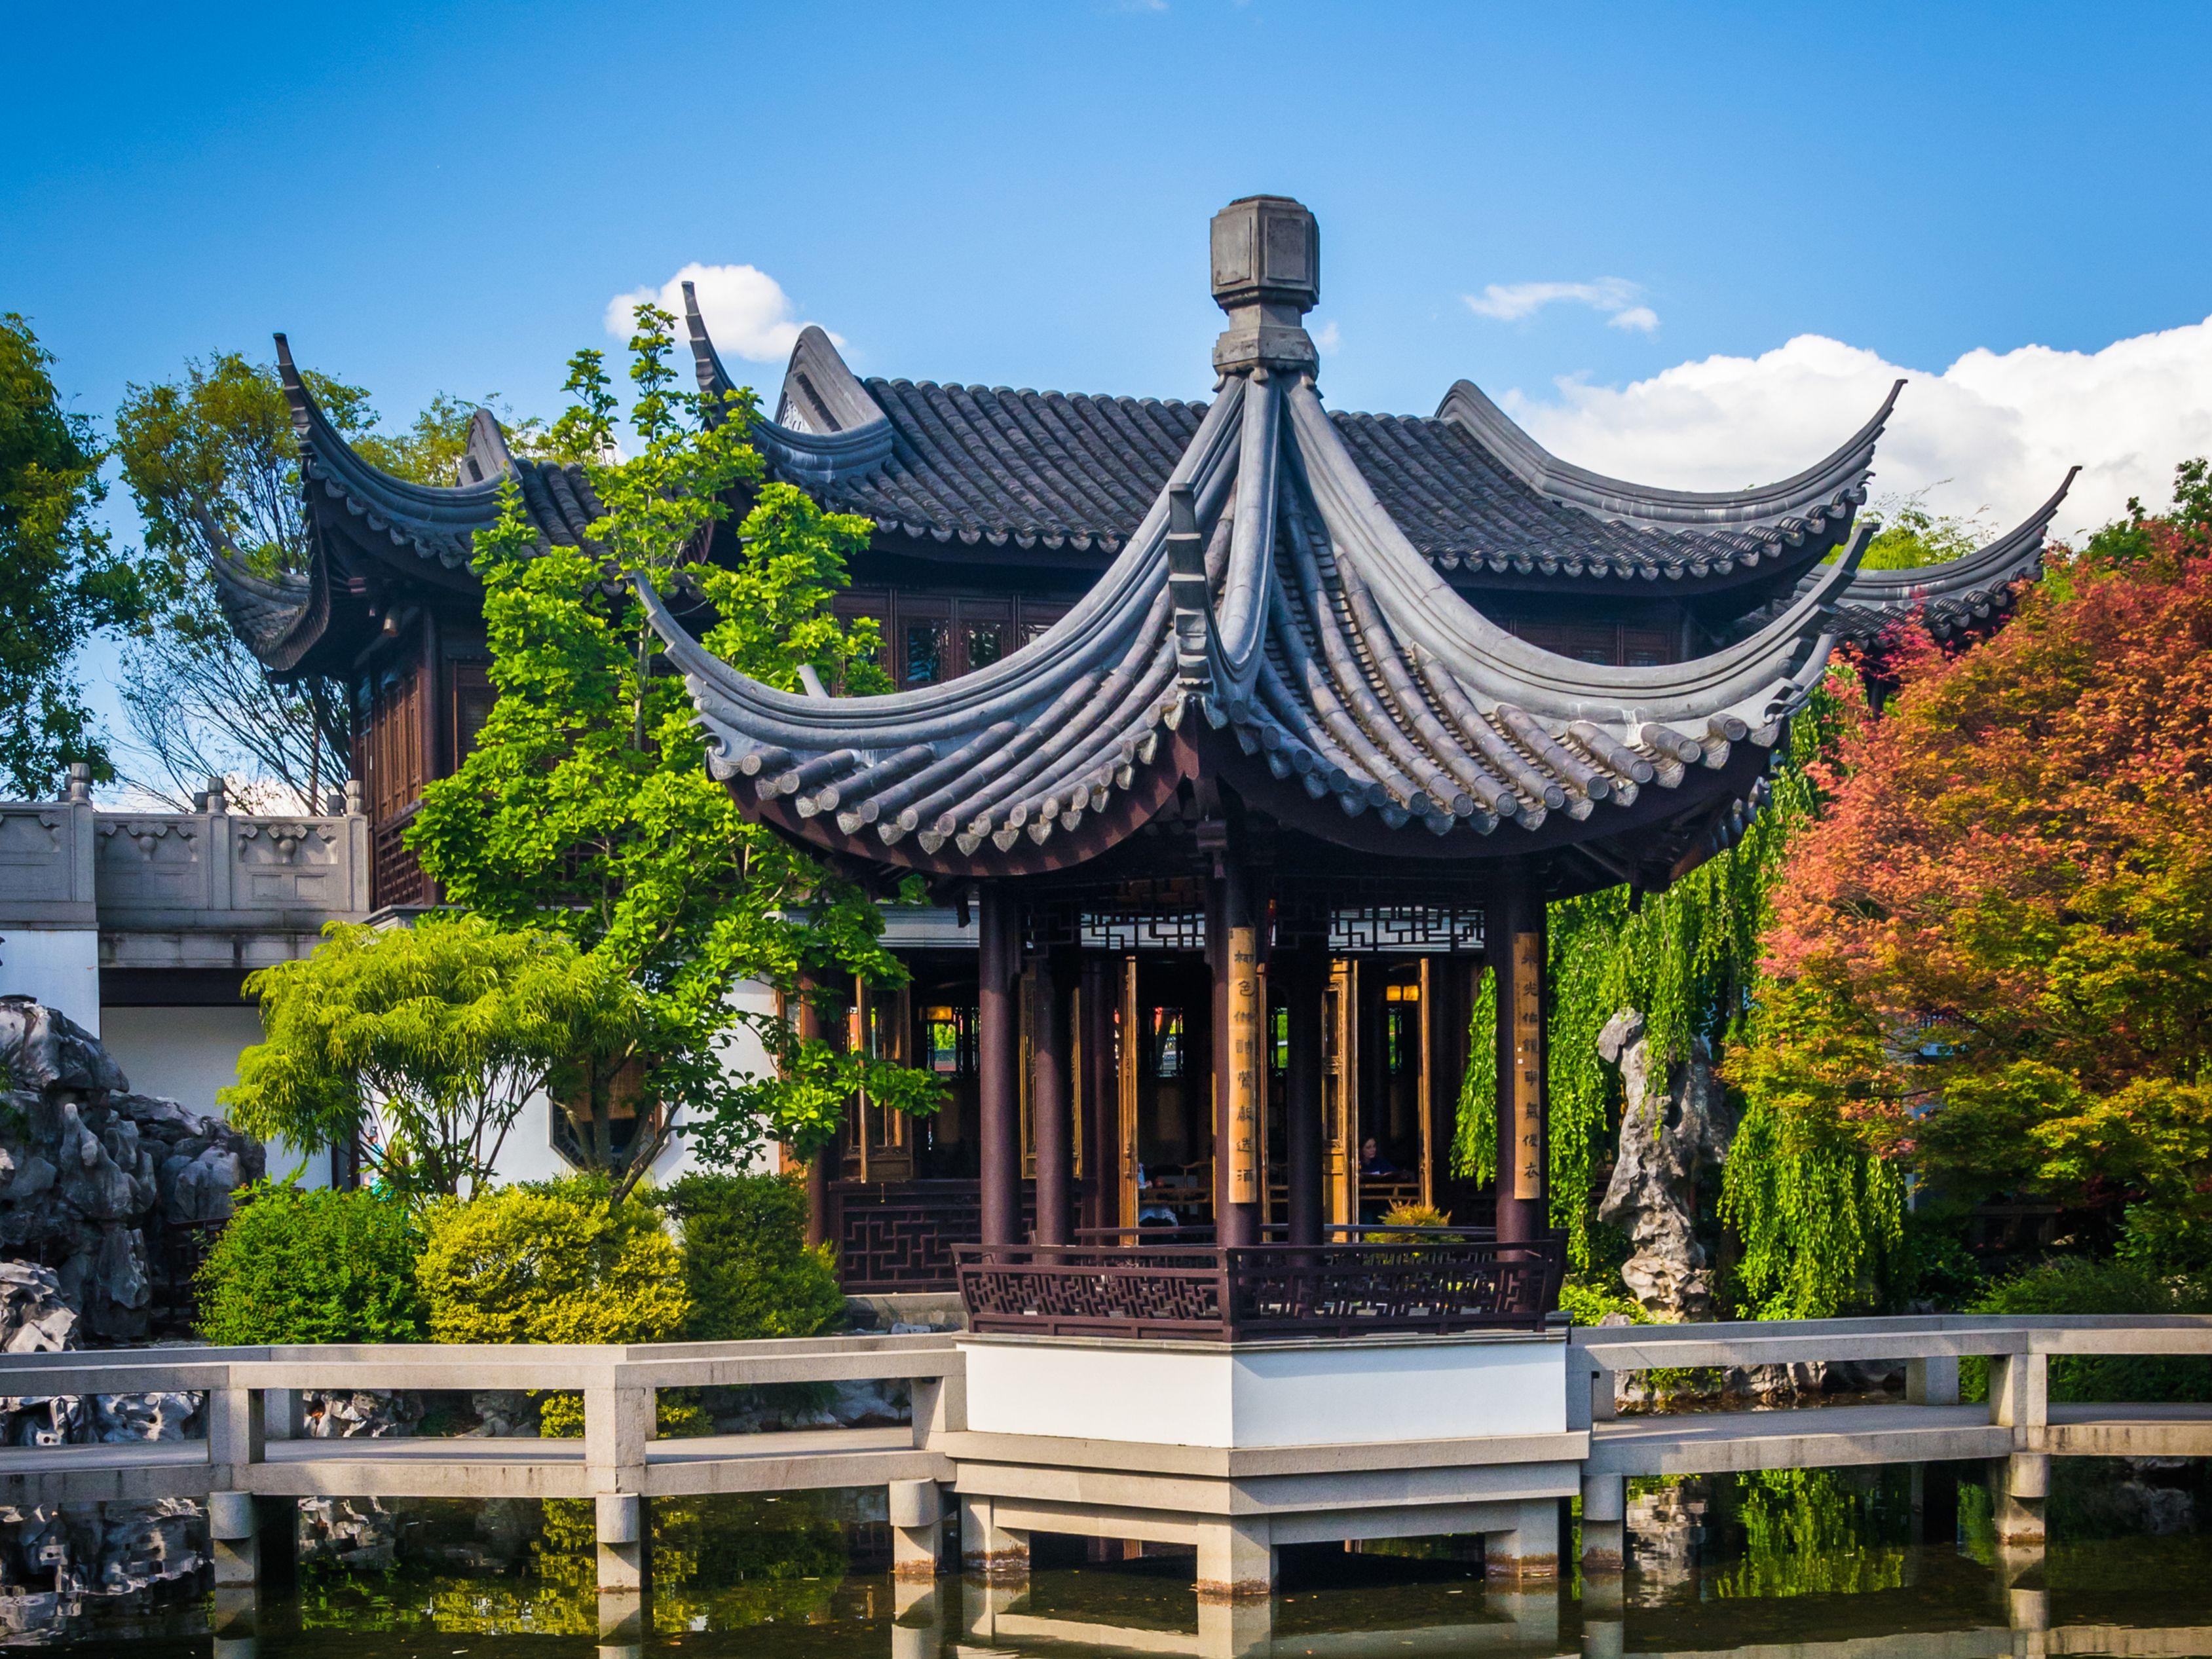 Jis 0216 portland lan su chinese garden rn2lxi